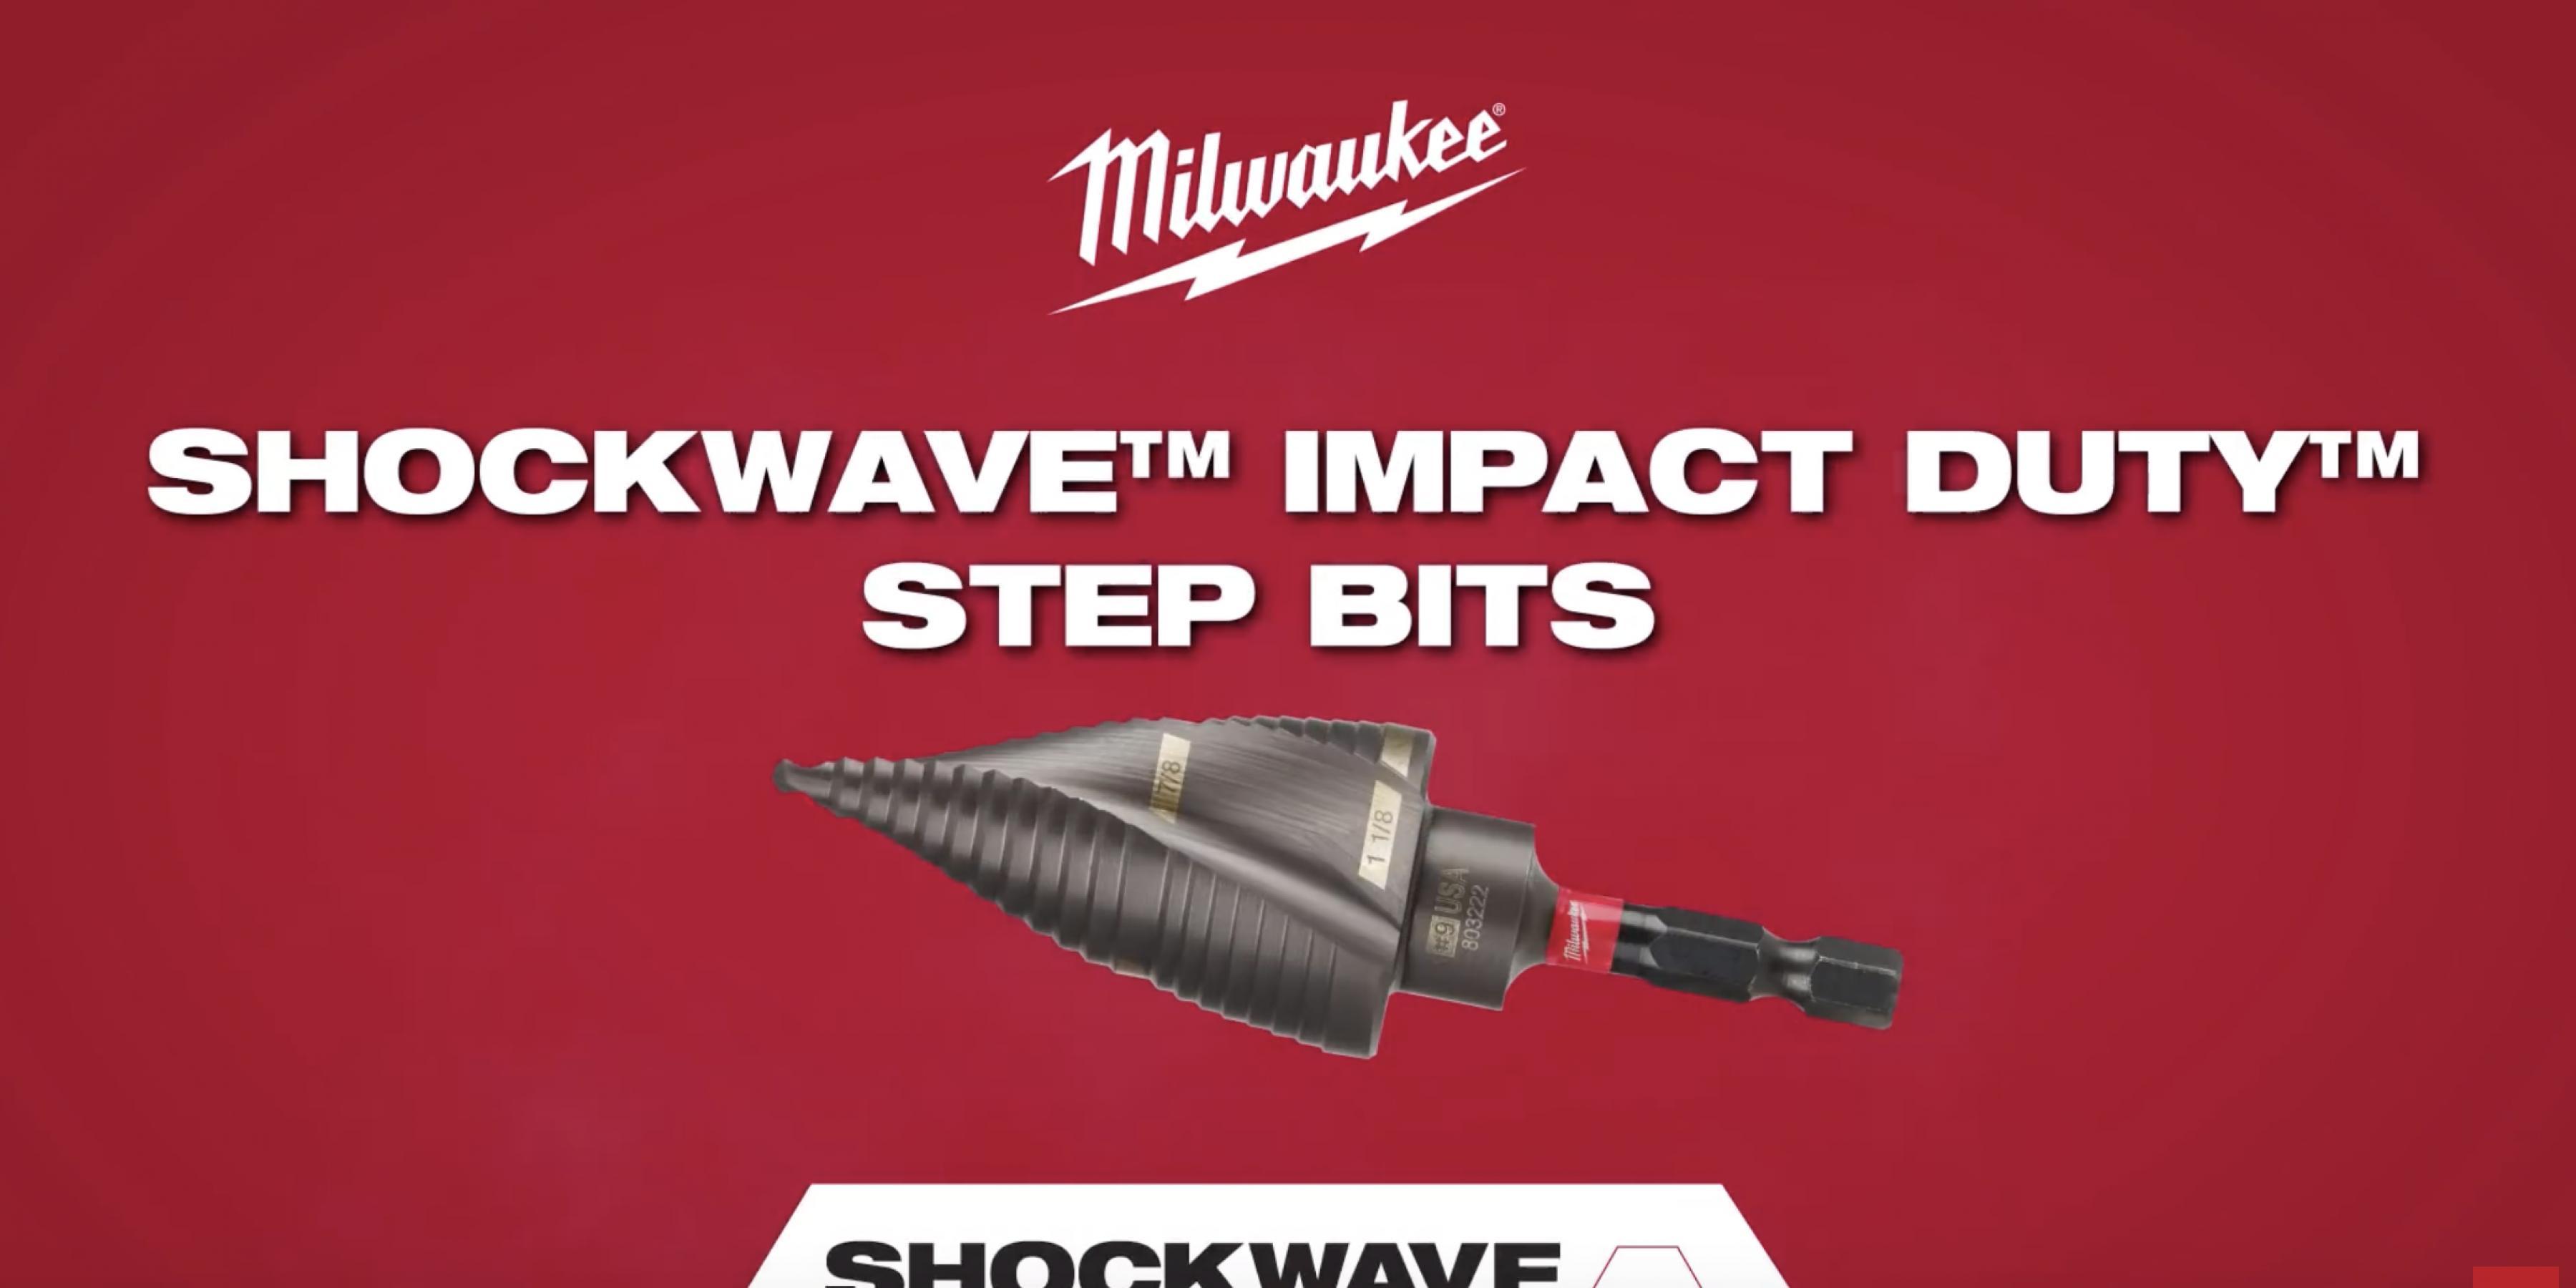 Milwaukee® Shockwave™ Impact Duty™ Step Bits